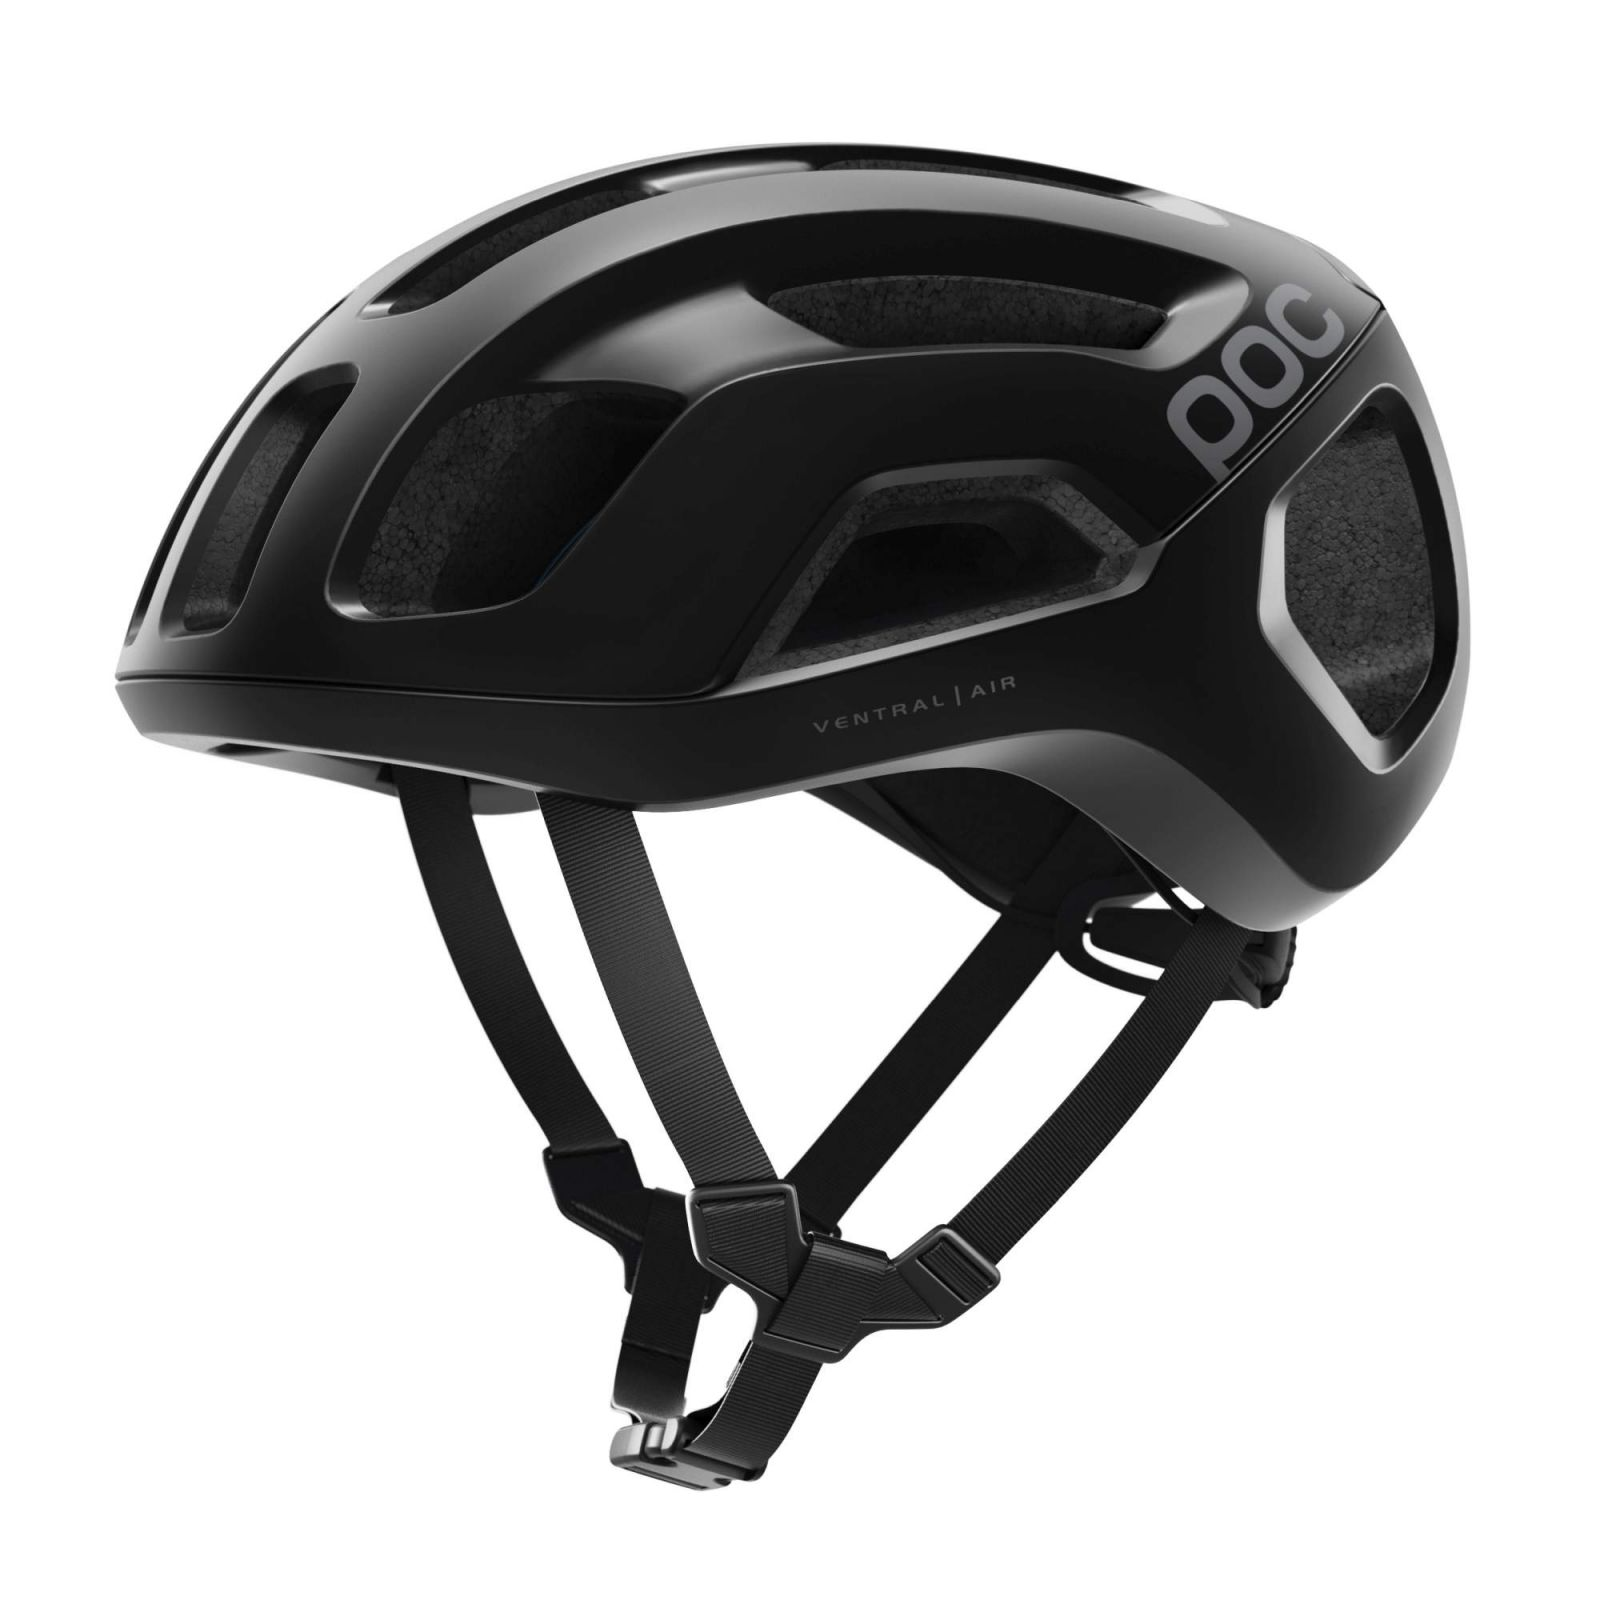 Cyklistická helma POC Ventral Air Spin, Uranium Black Matt, PC106701037